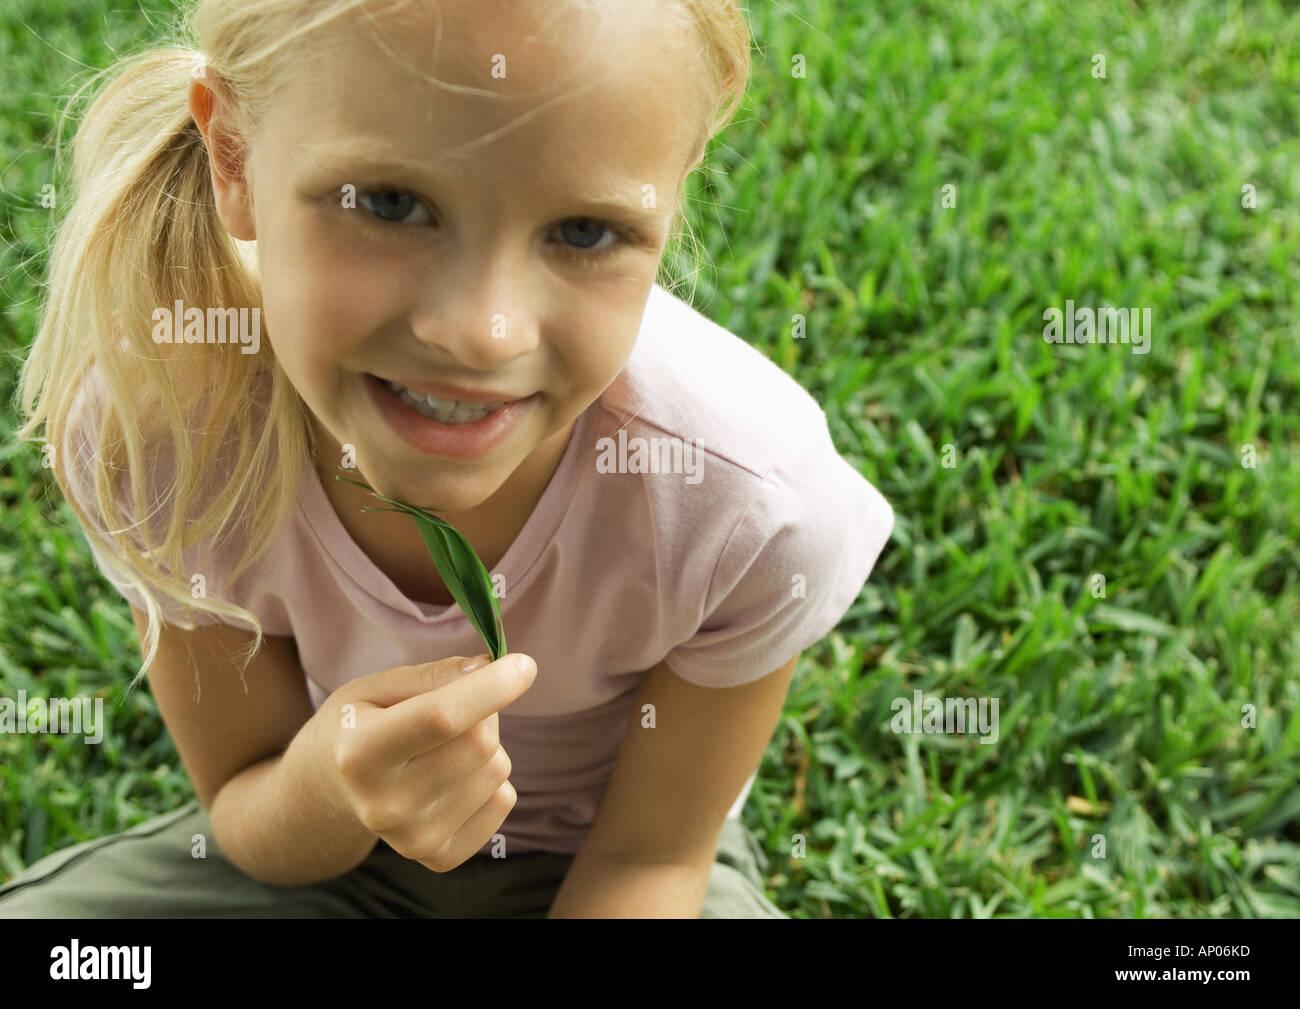 Girl holding leaf under chin - Stock Image